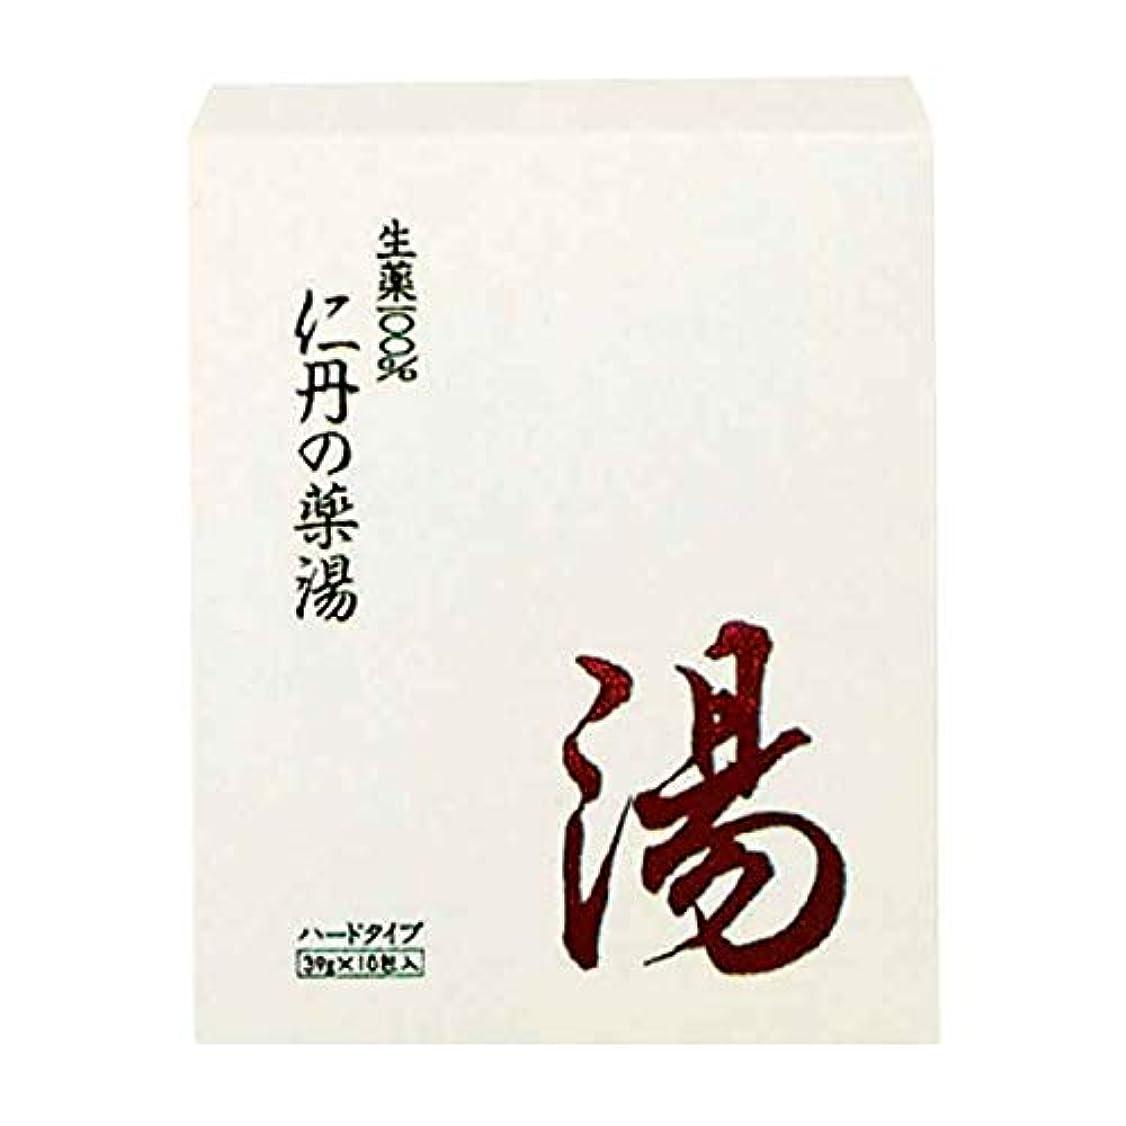 森下仁丹 仁丹の薬湯(ハード) 10包 [医薬部外品]